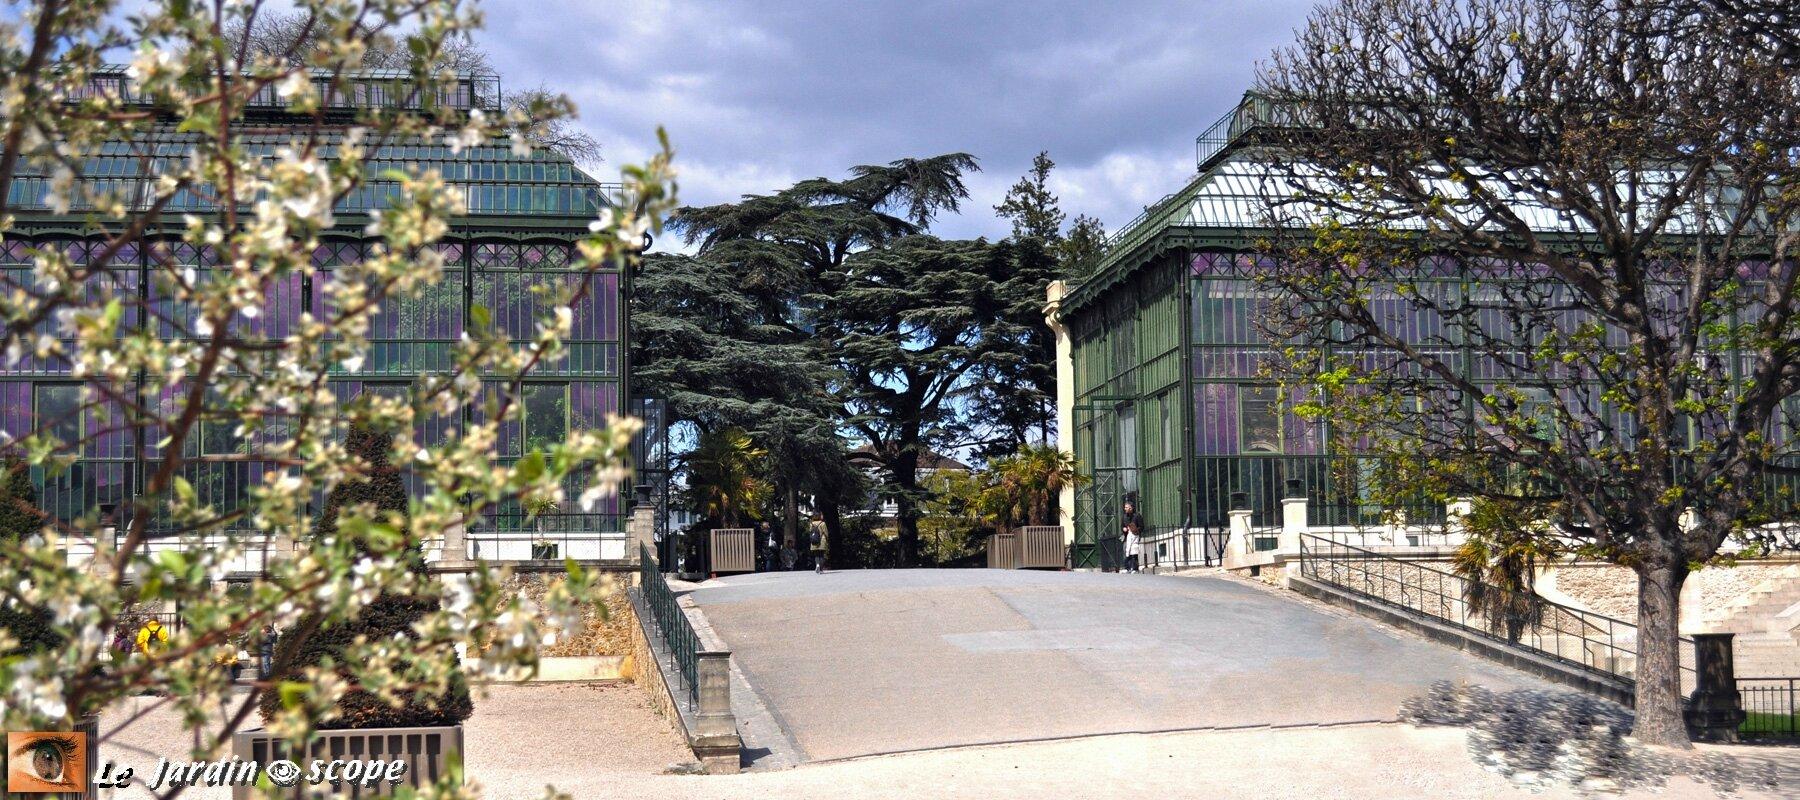 Les grandes serres du jardin des plantes de paris le - Serres jardin des plantes ...